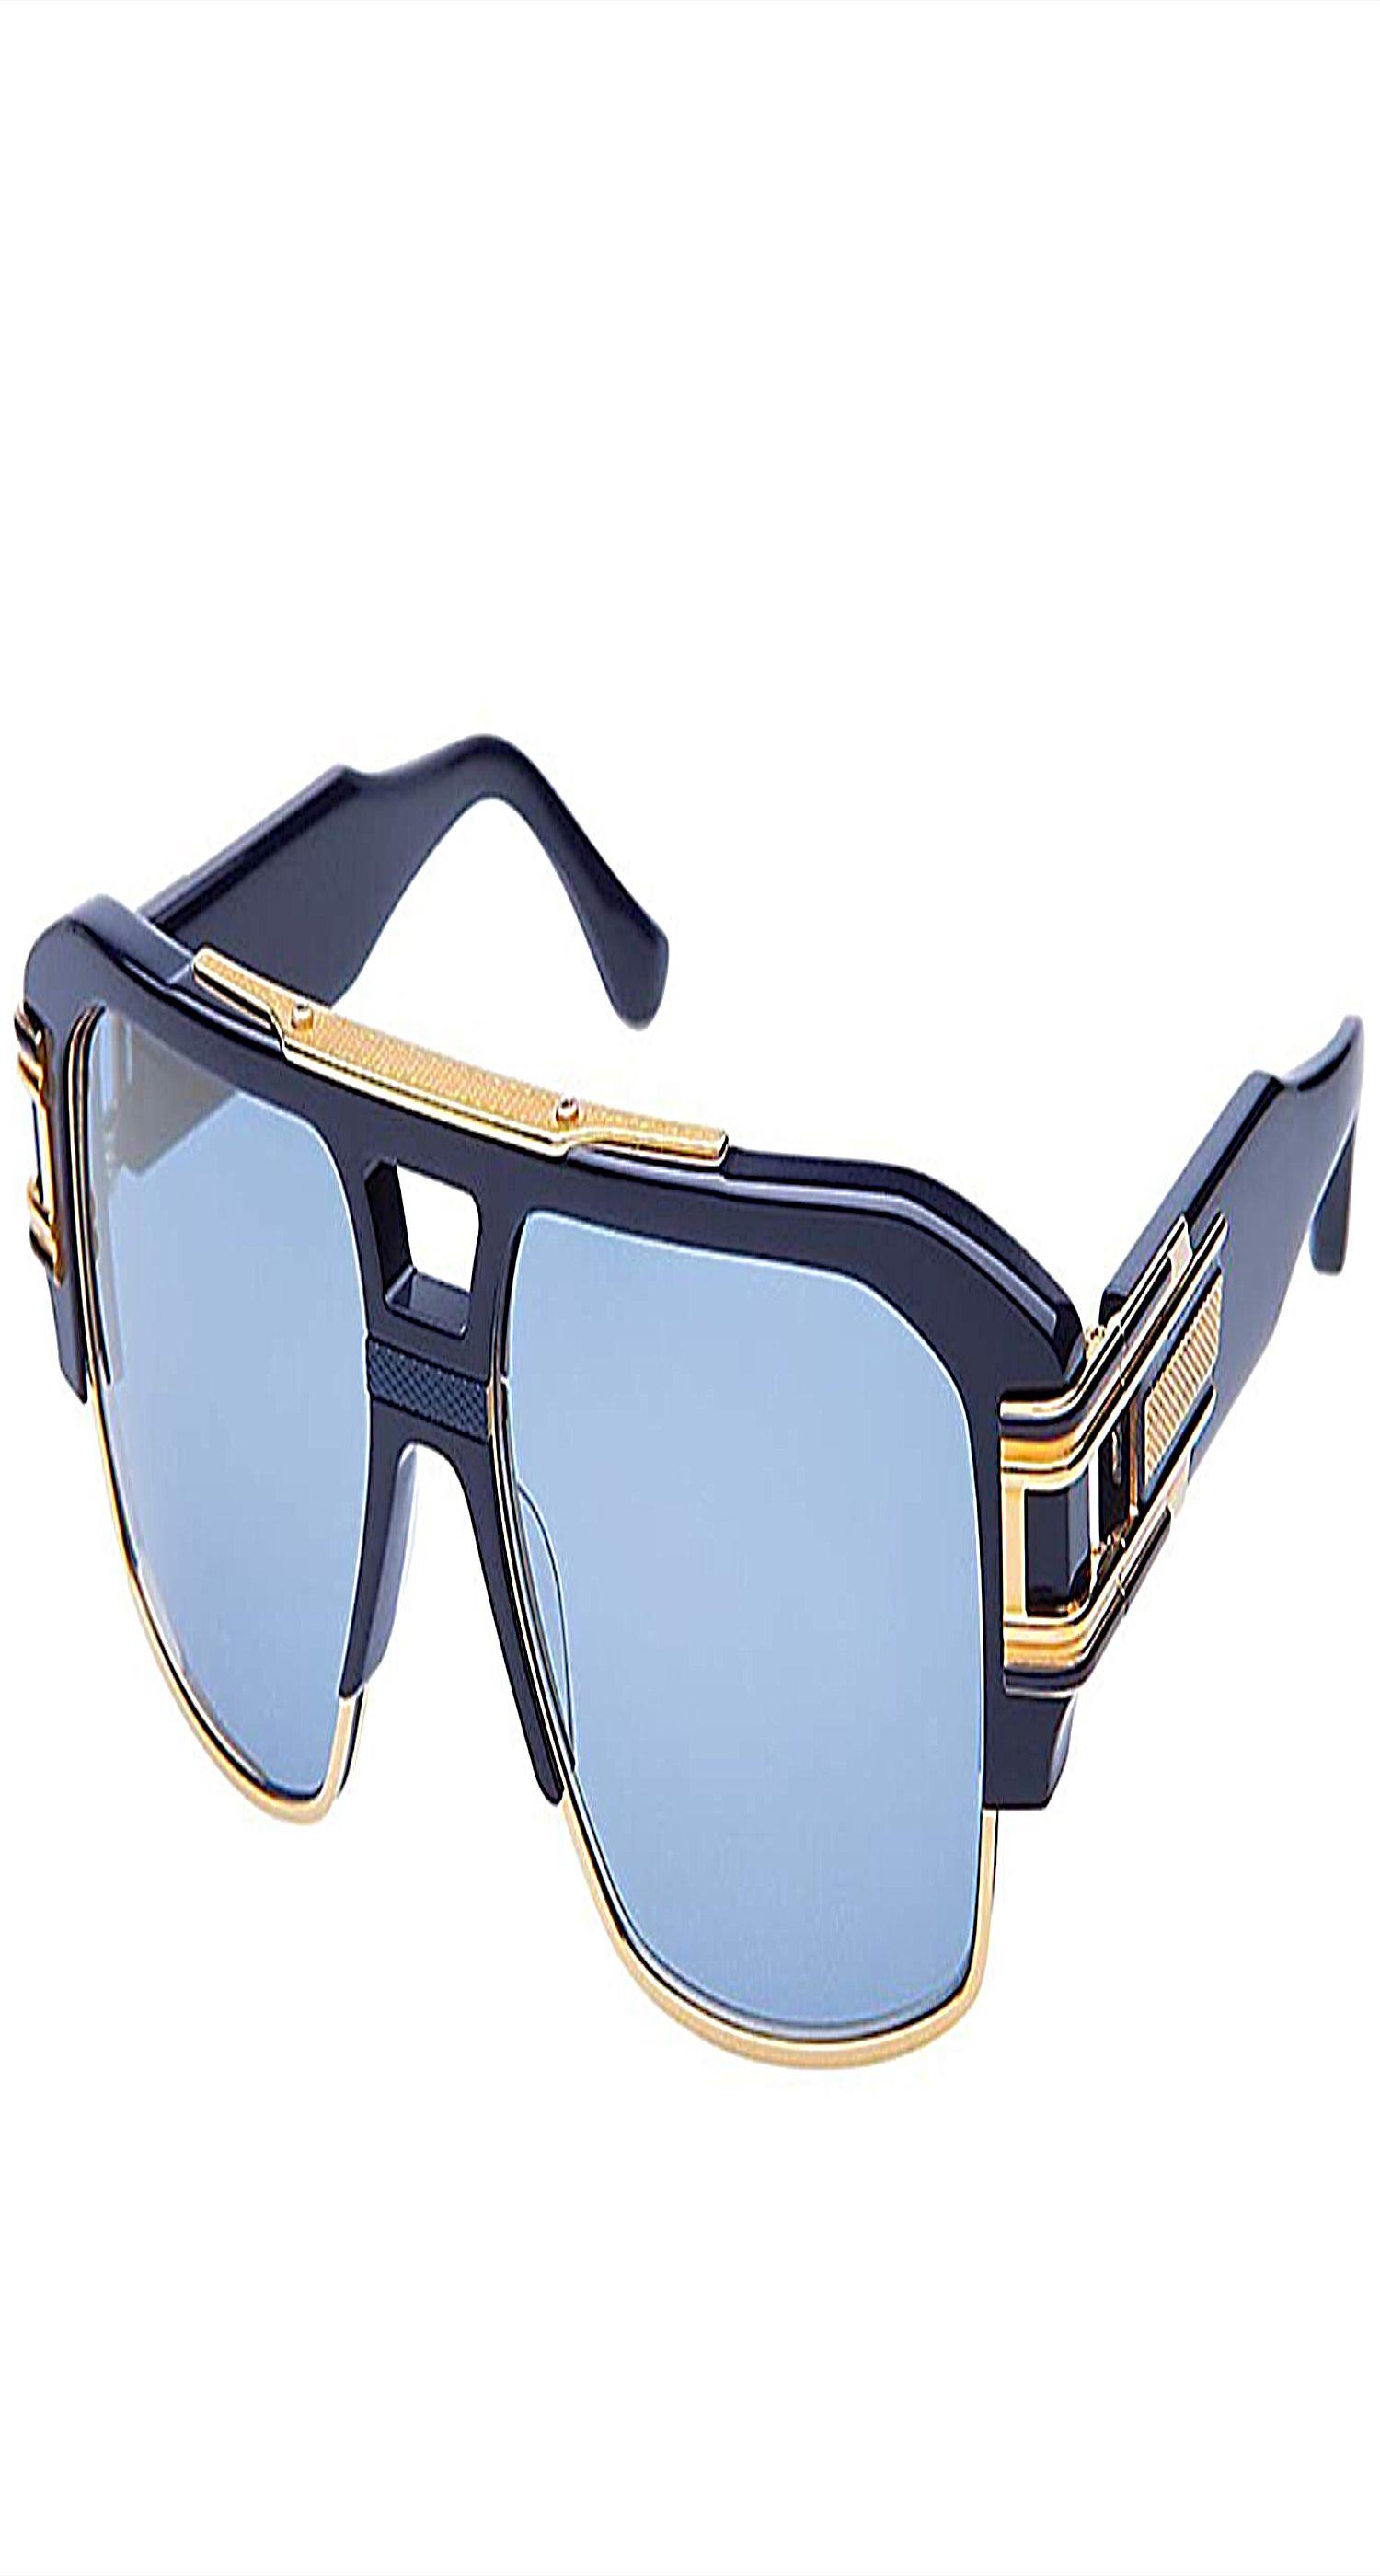 3710ba9e264 Dita GRANDMASTER FOUR DRX 2060 B-NVY-GLD Navy18K Gold w Blue w Gold ...